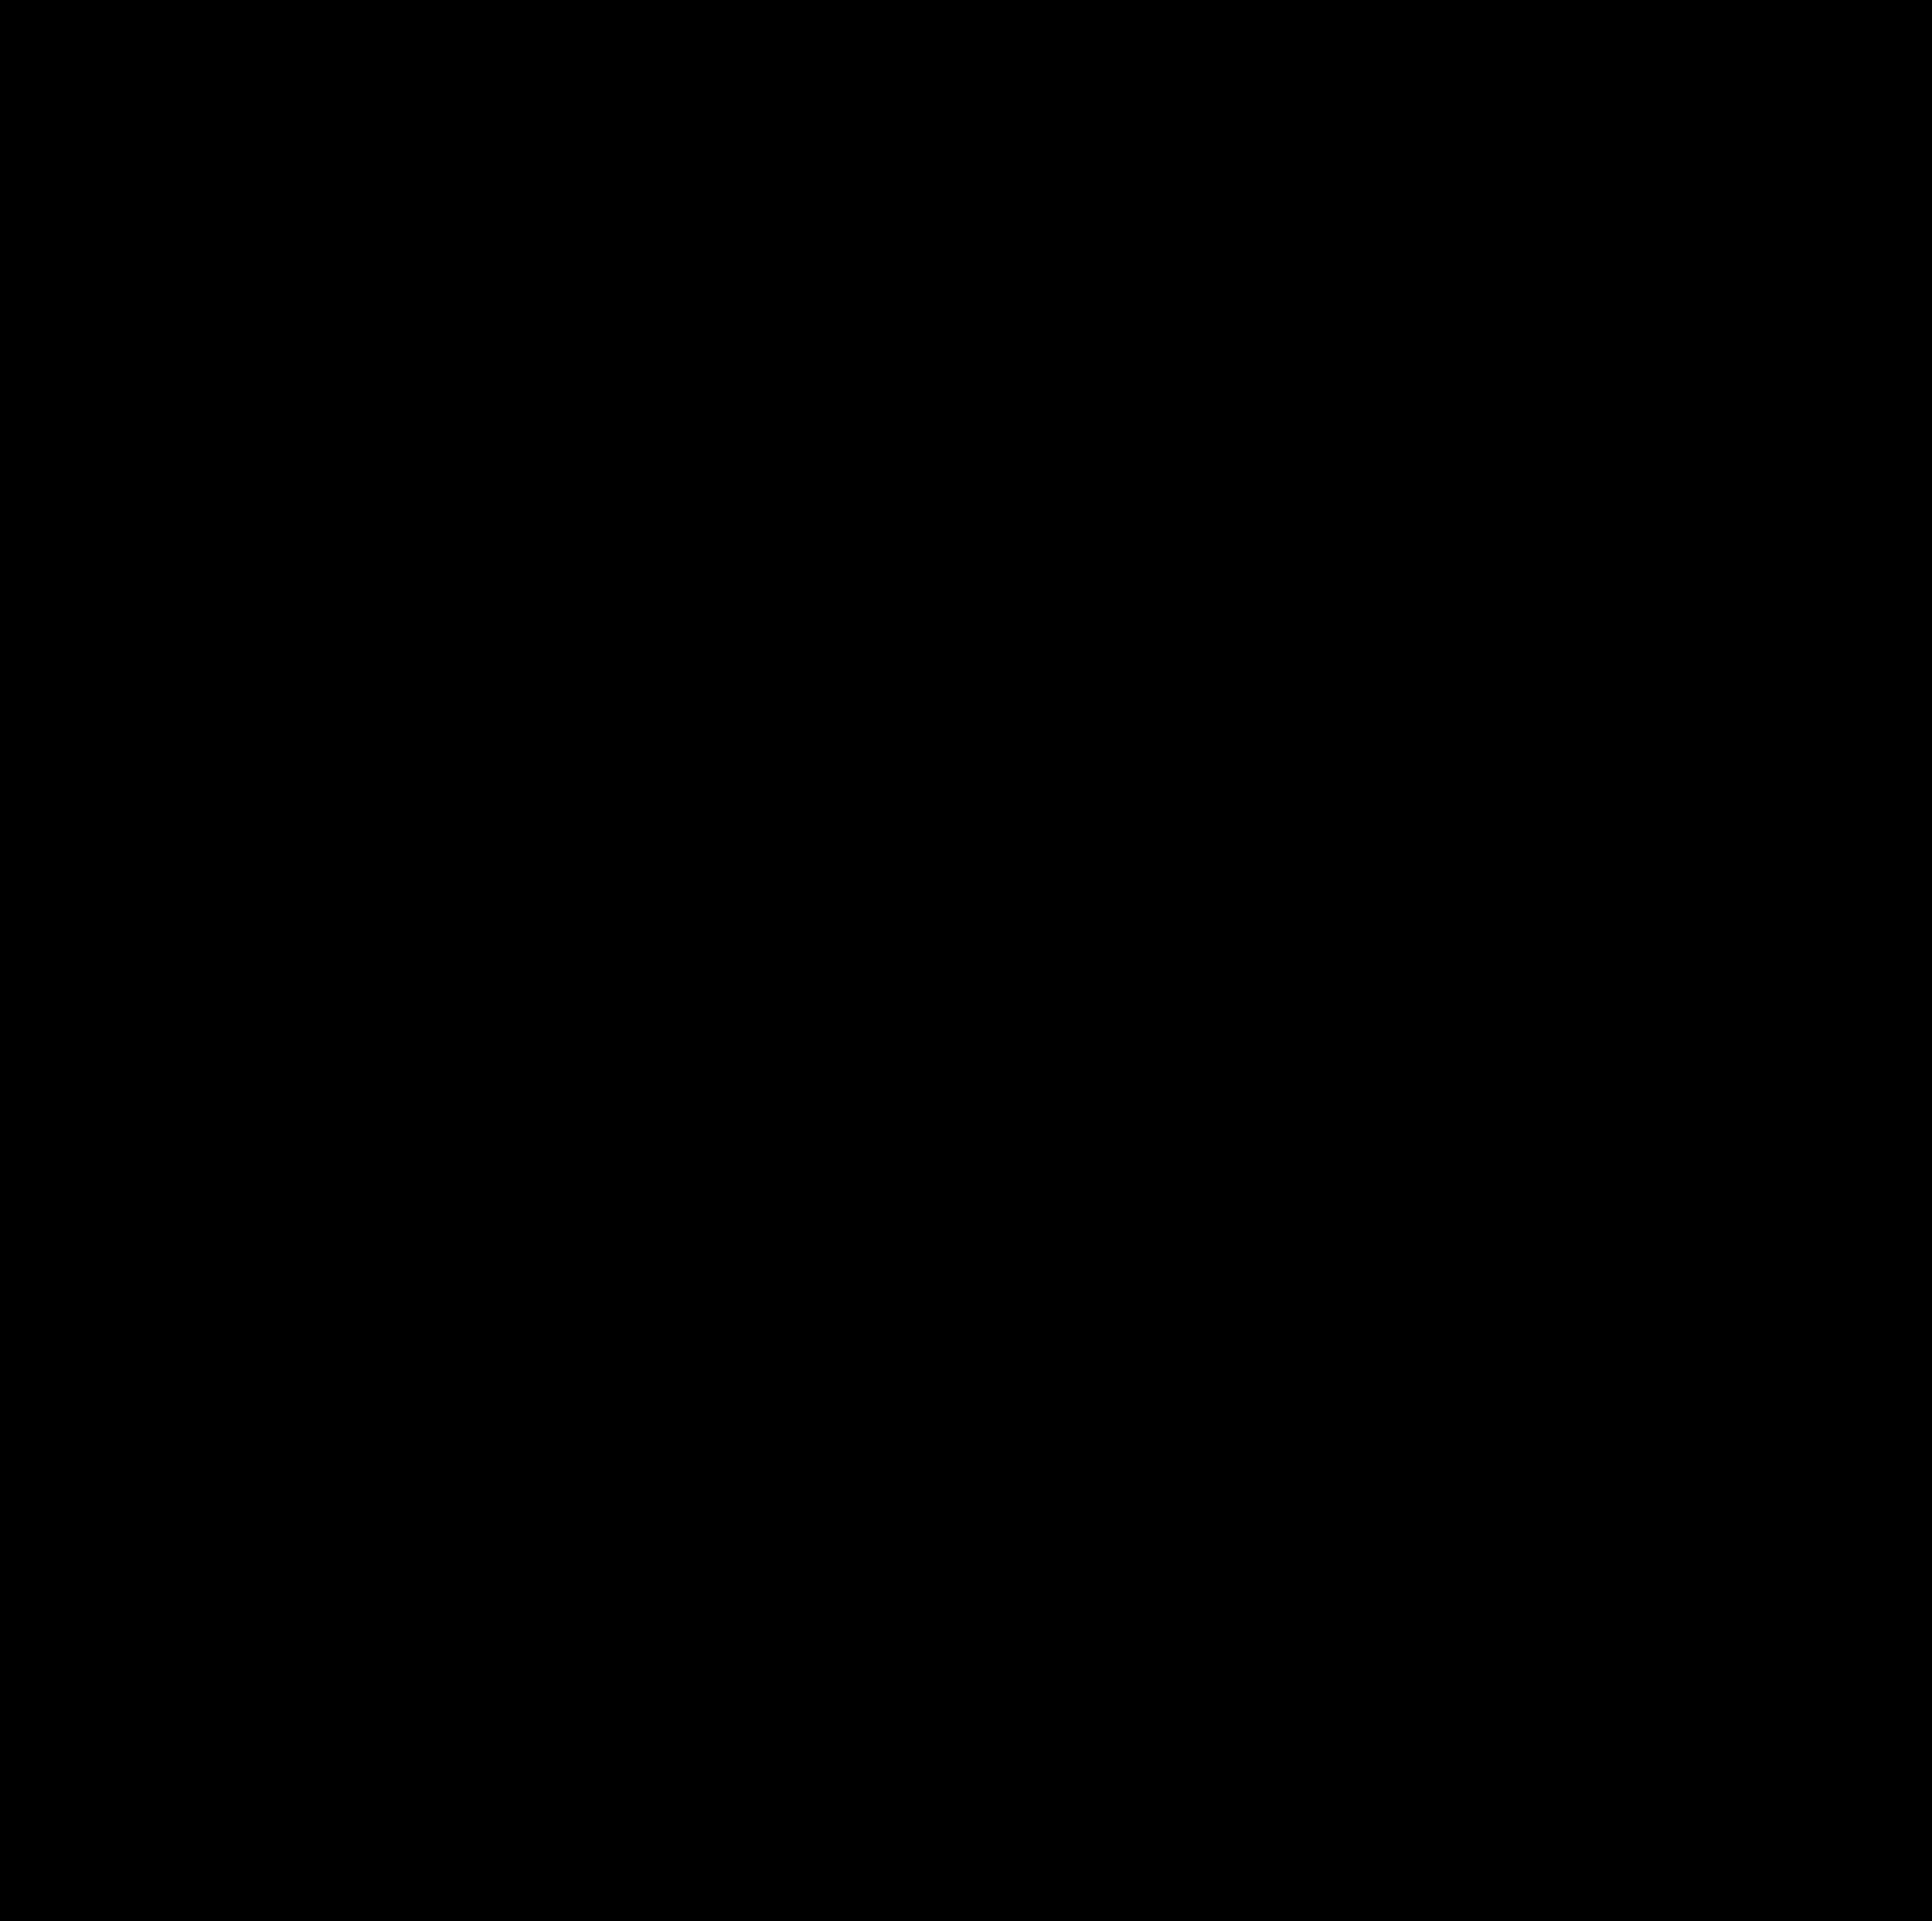 Paw 652